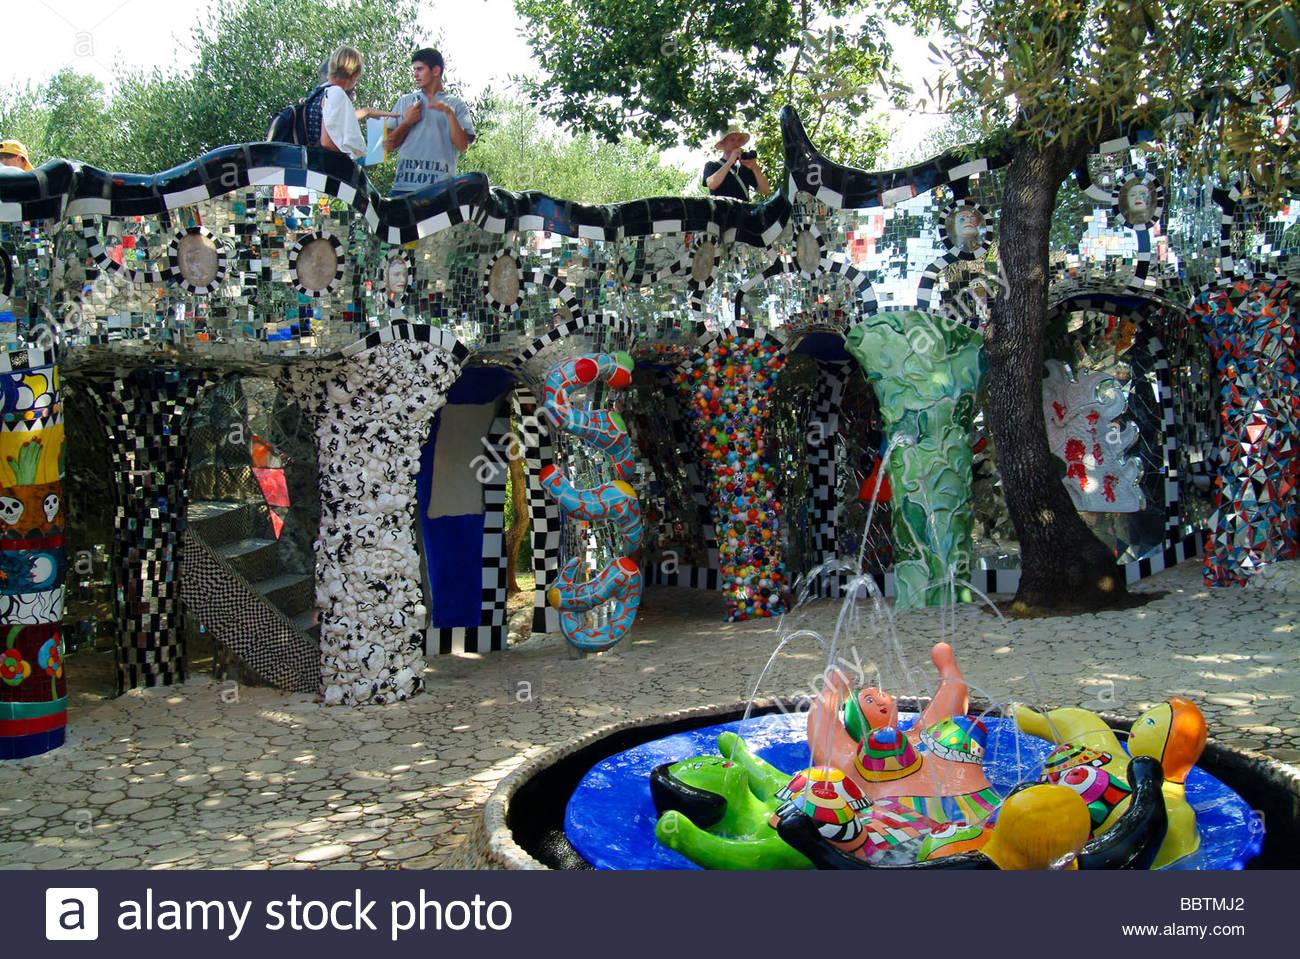 Giardino dei tarocchi garavicchio tuscany italy stock photo 24514618 alamy - Il giardino dei tarocchi ...